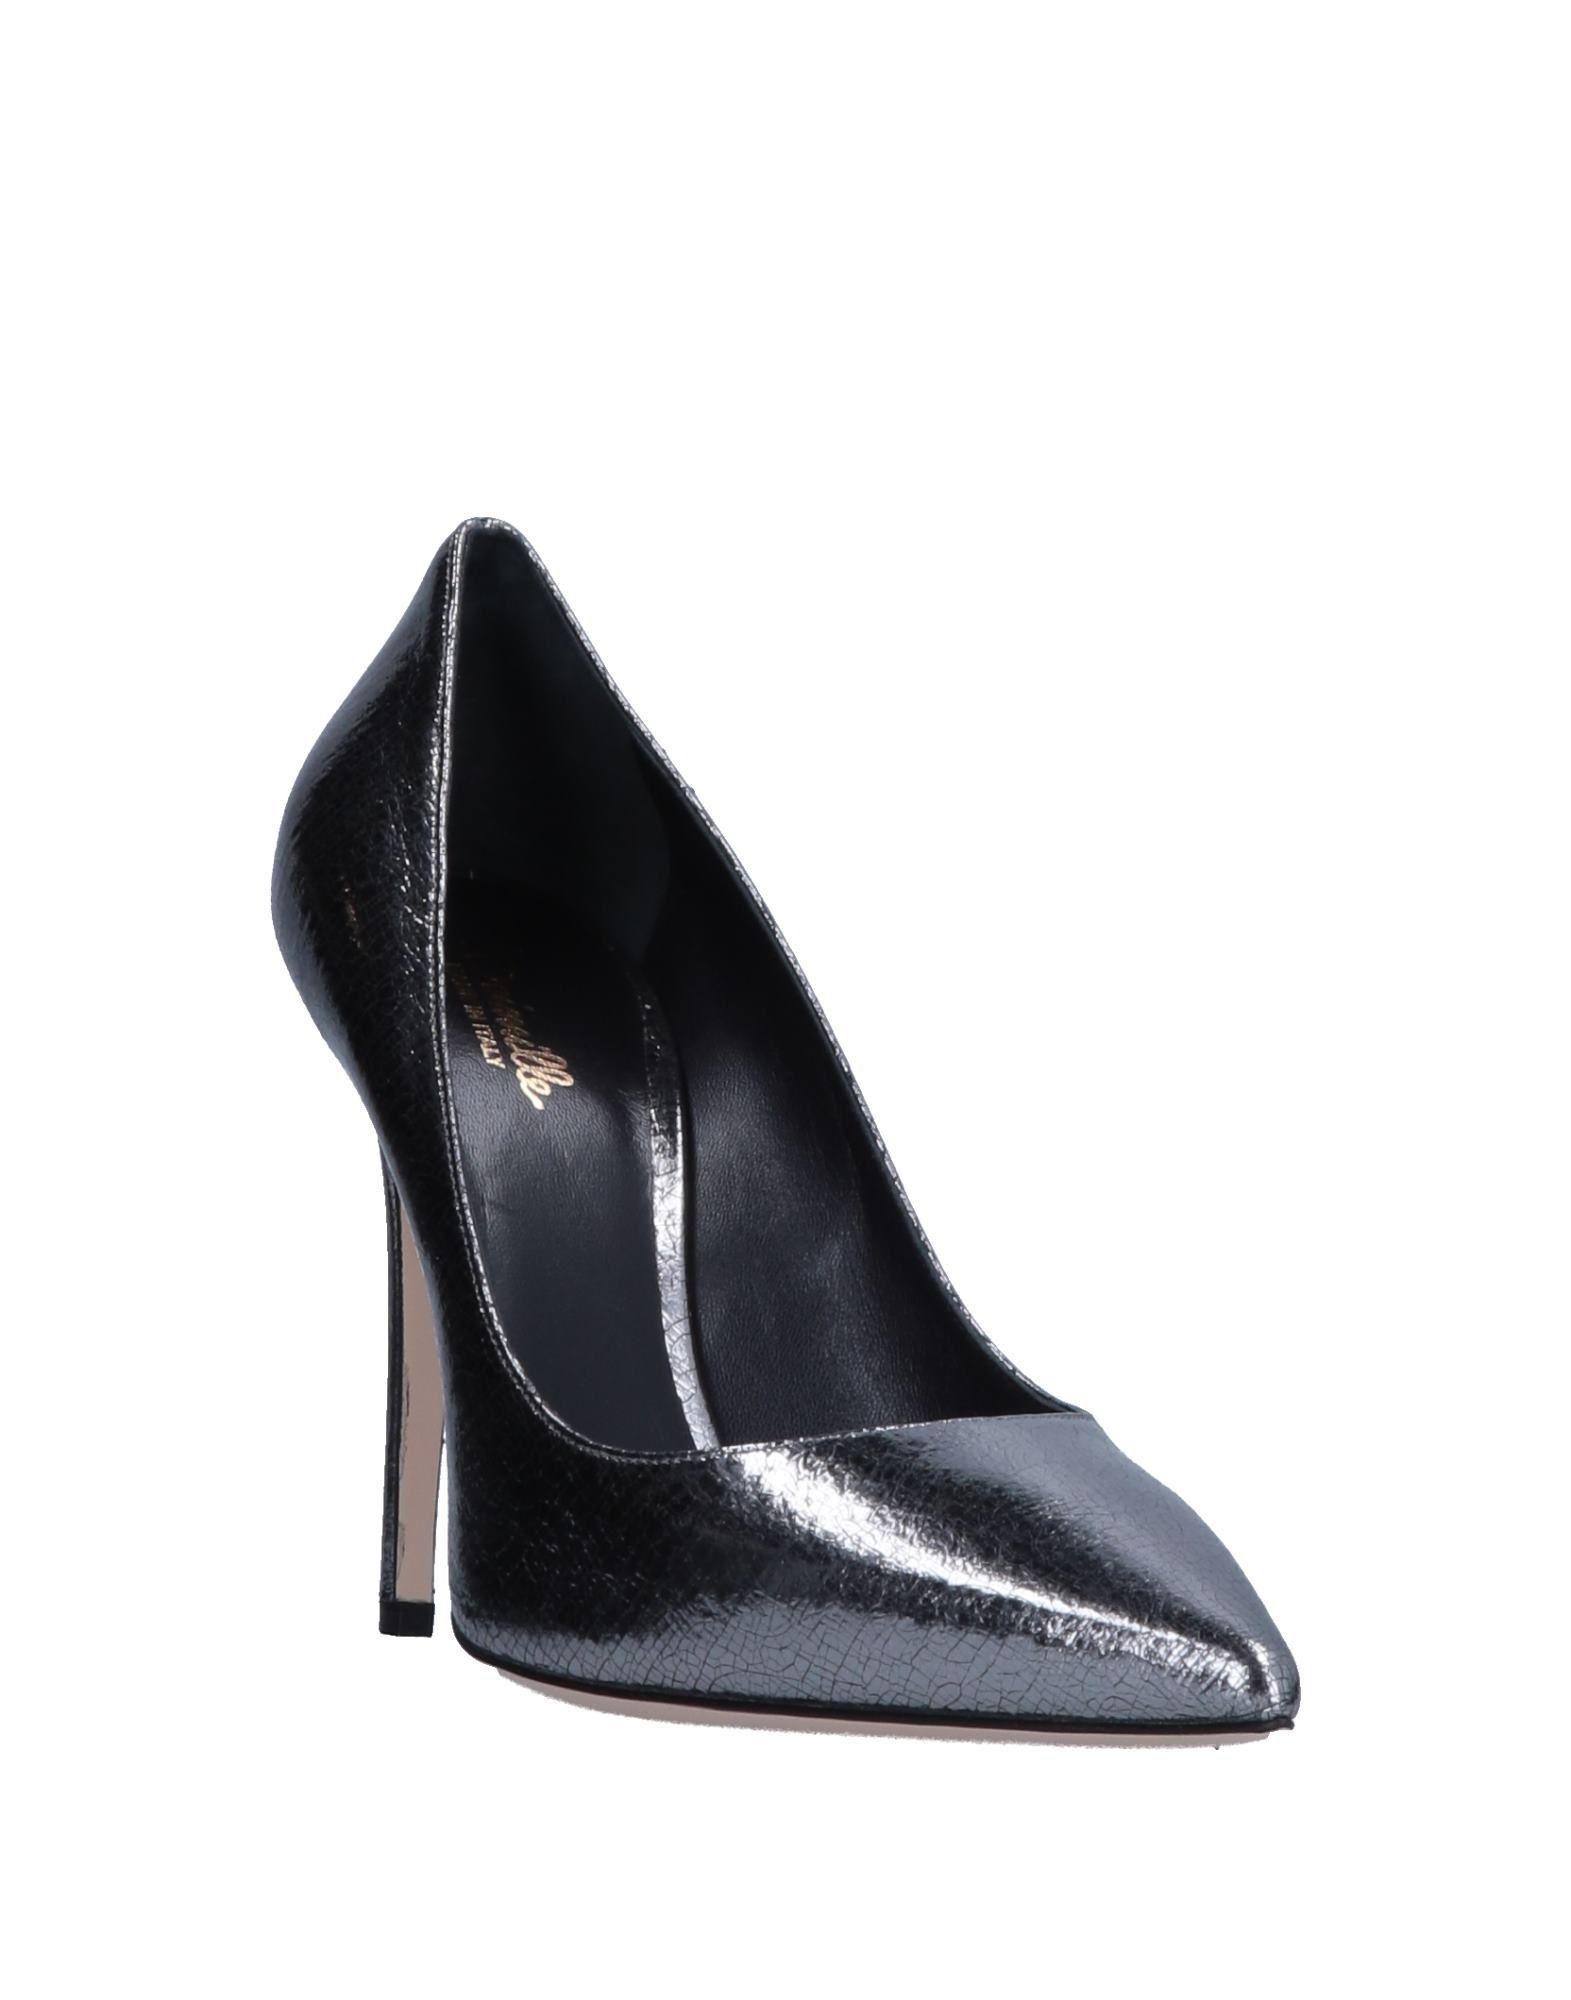 Stilvolle billige Pumps Schuhe Deimille Pumps billige Damen  11557079EL 7d9d74